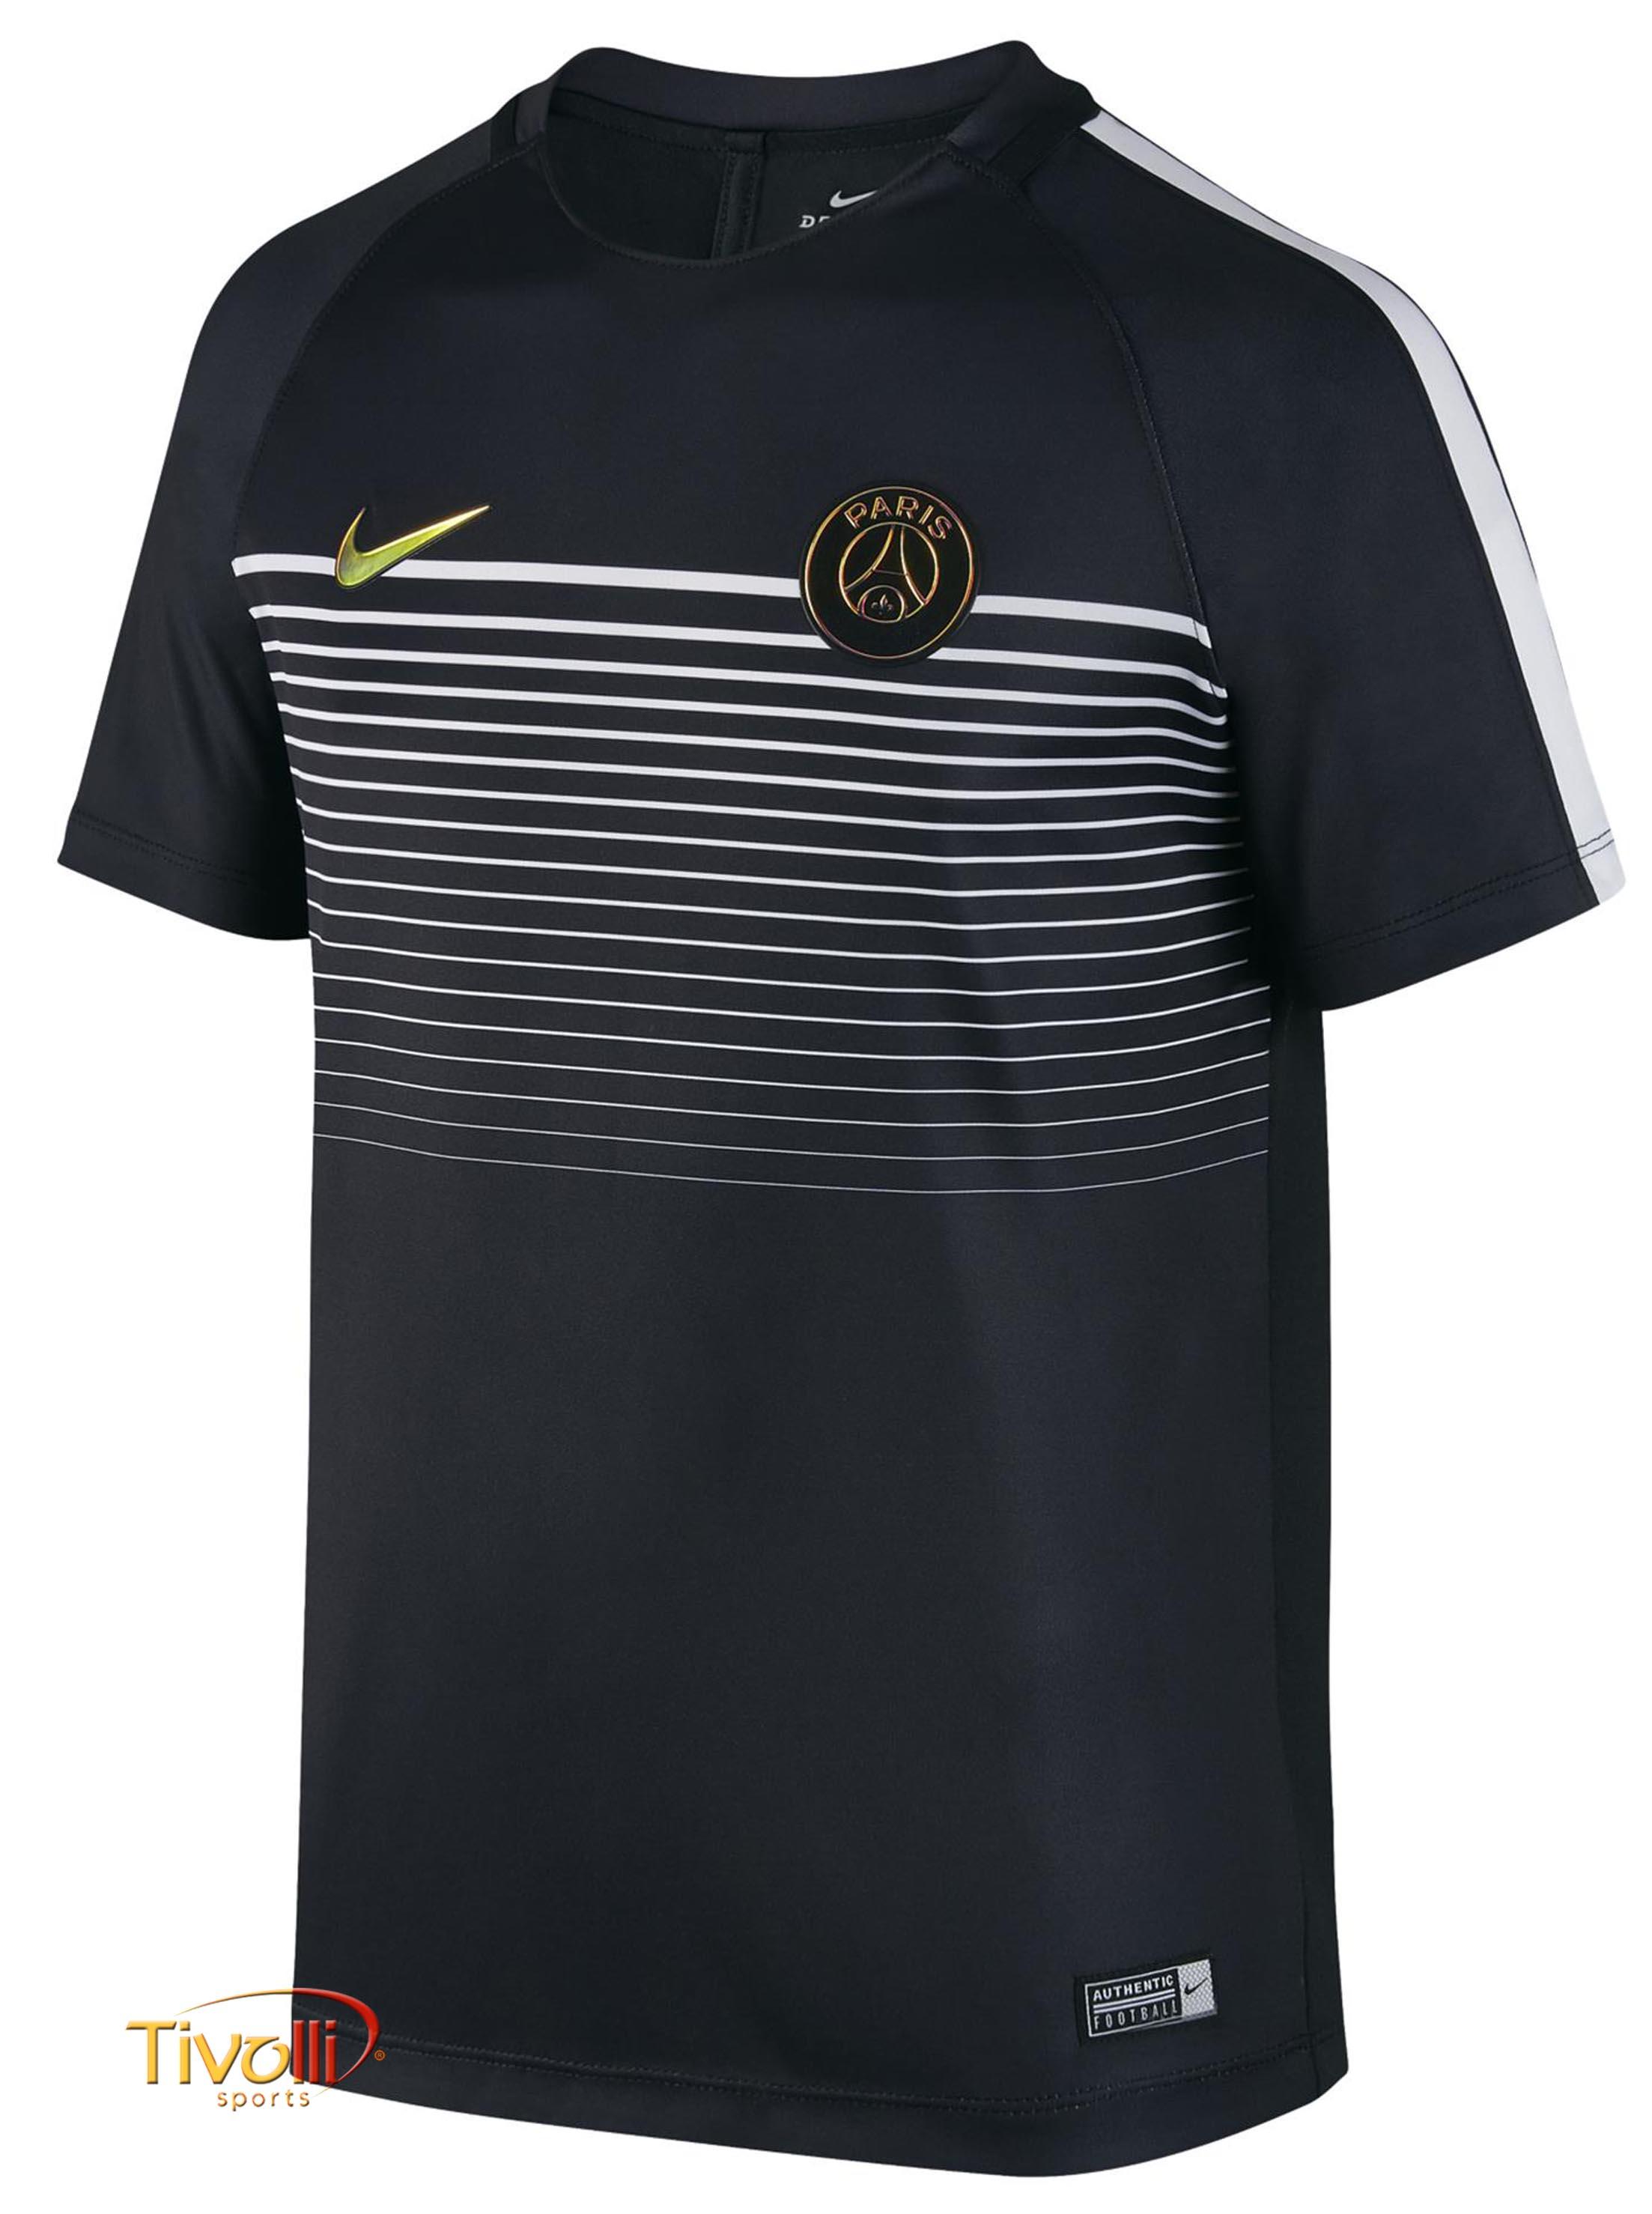 Camisa Nike PSG Paris Saint-Germain Top Squad Infantil Preta e Branca a5633e98cc0b4